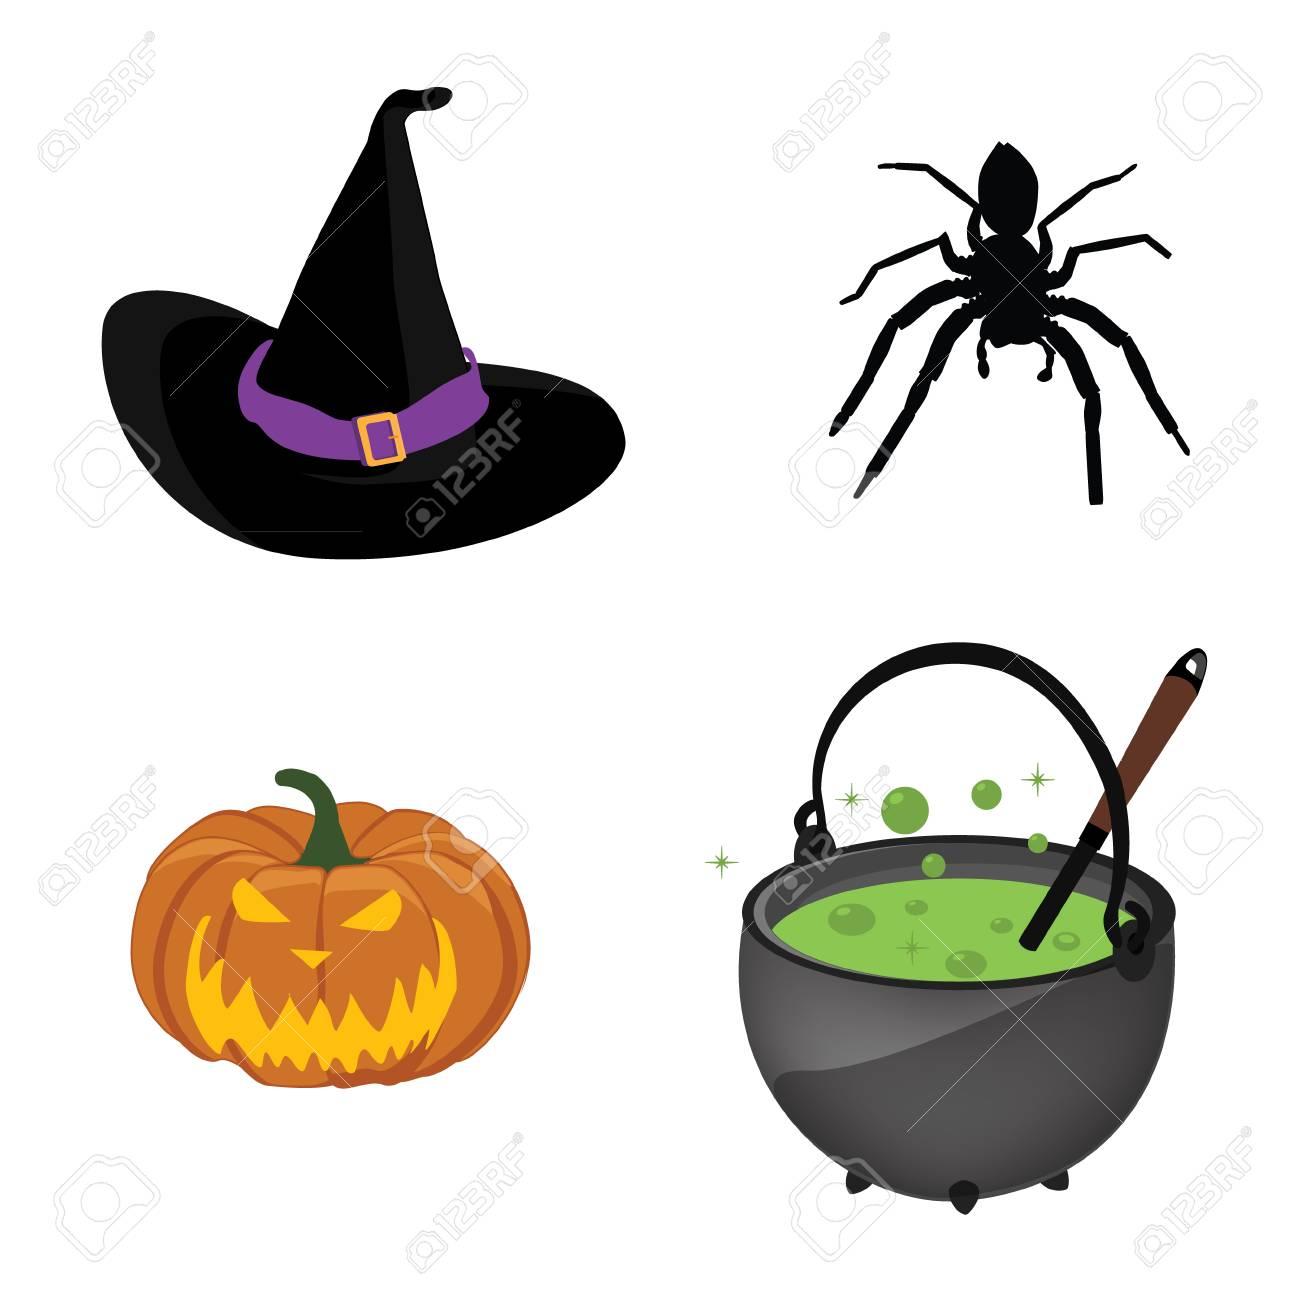 272de3d93 Halloween symbols collection. Black witch hat, pumpkin, spider..